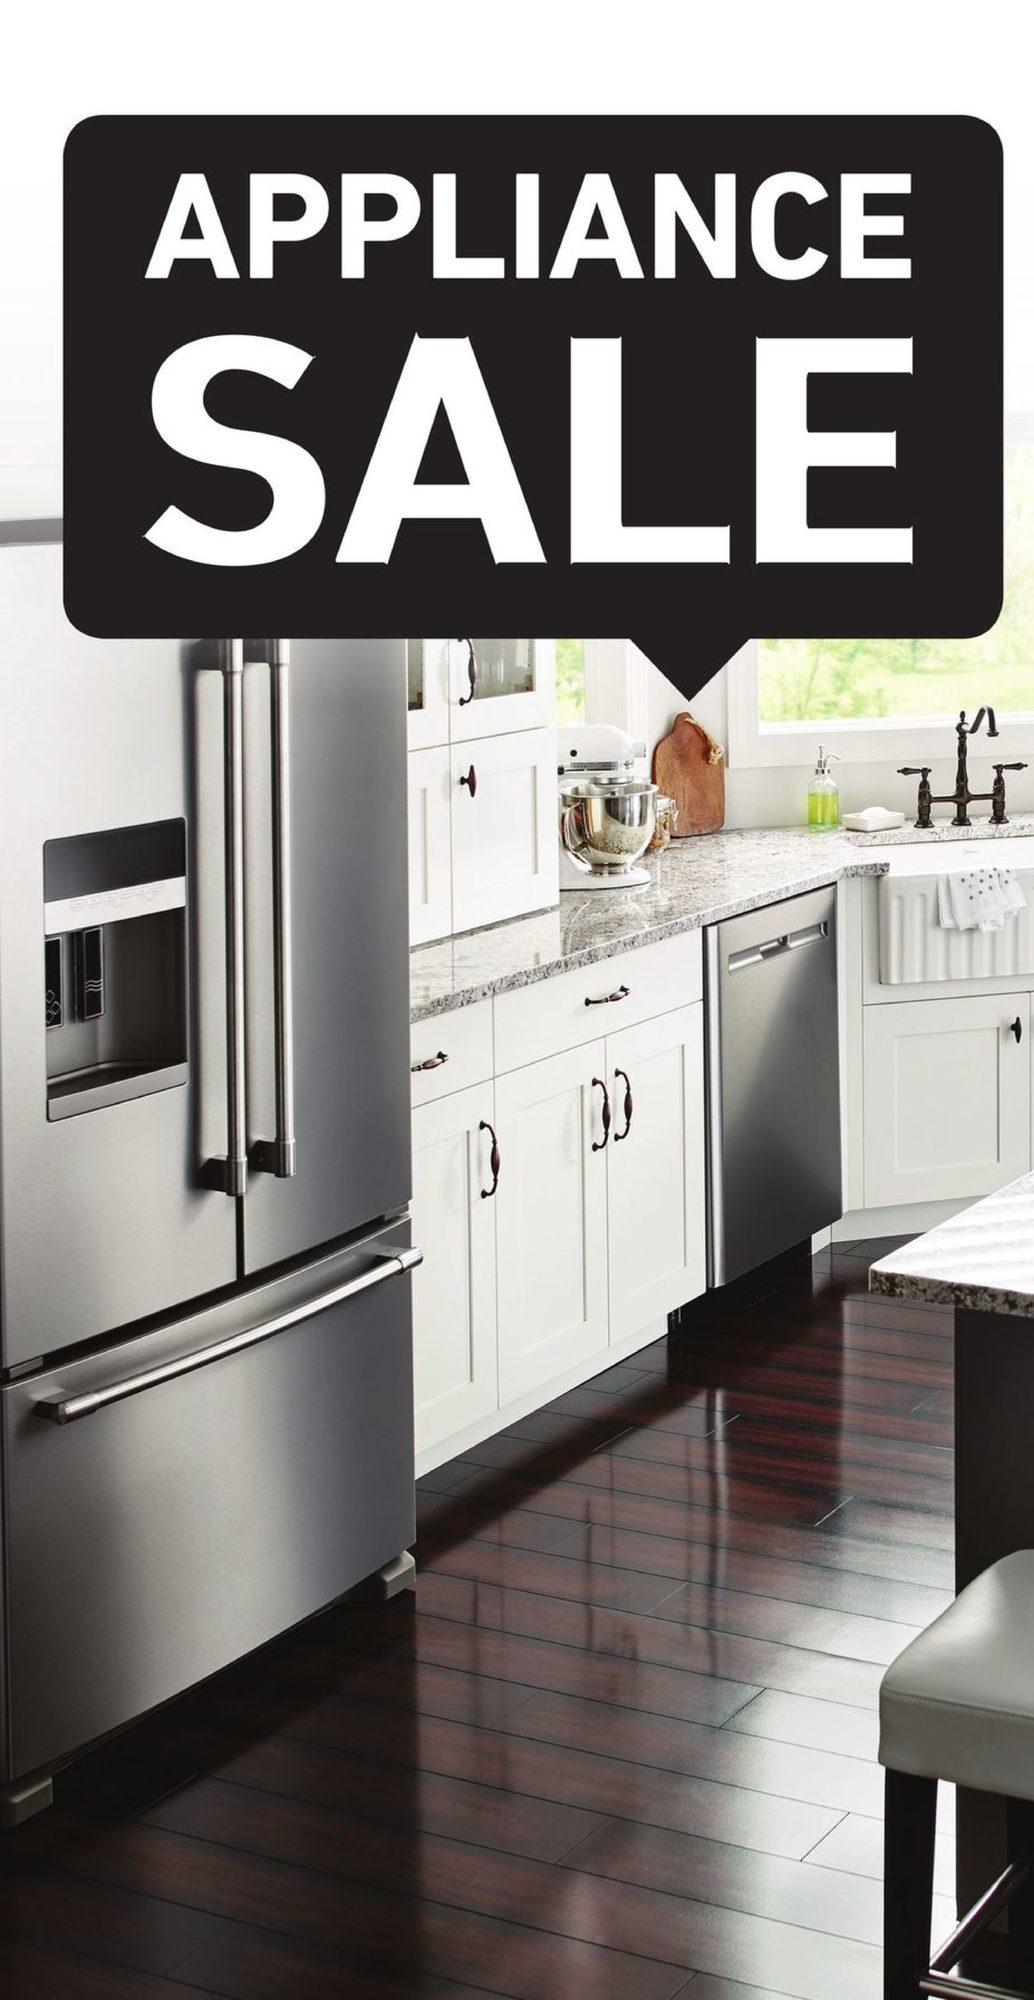 Leon's - Appliance Sale